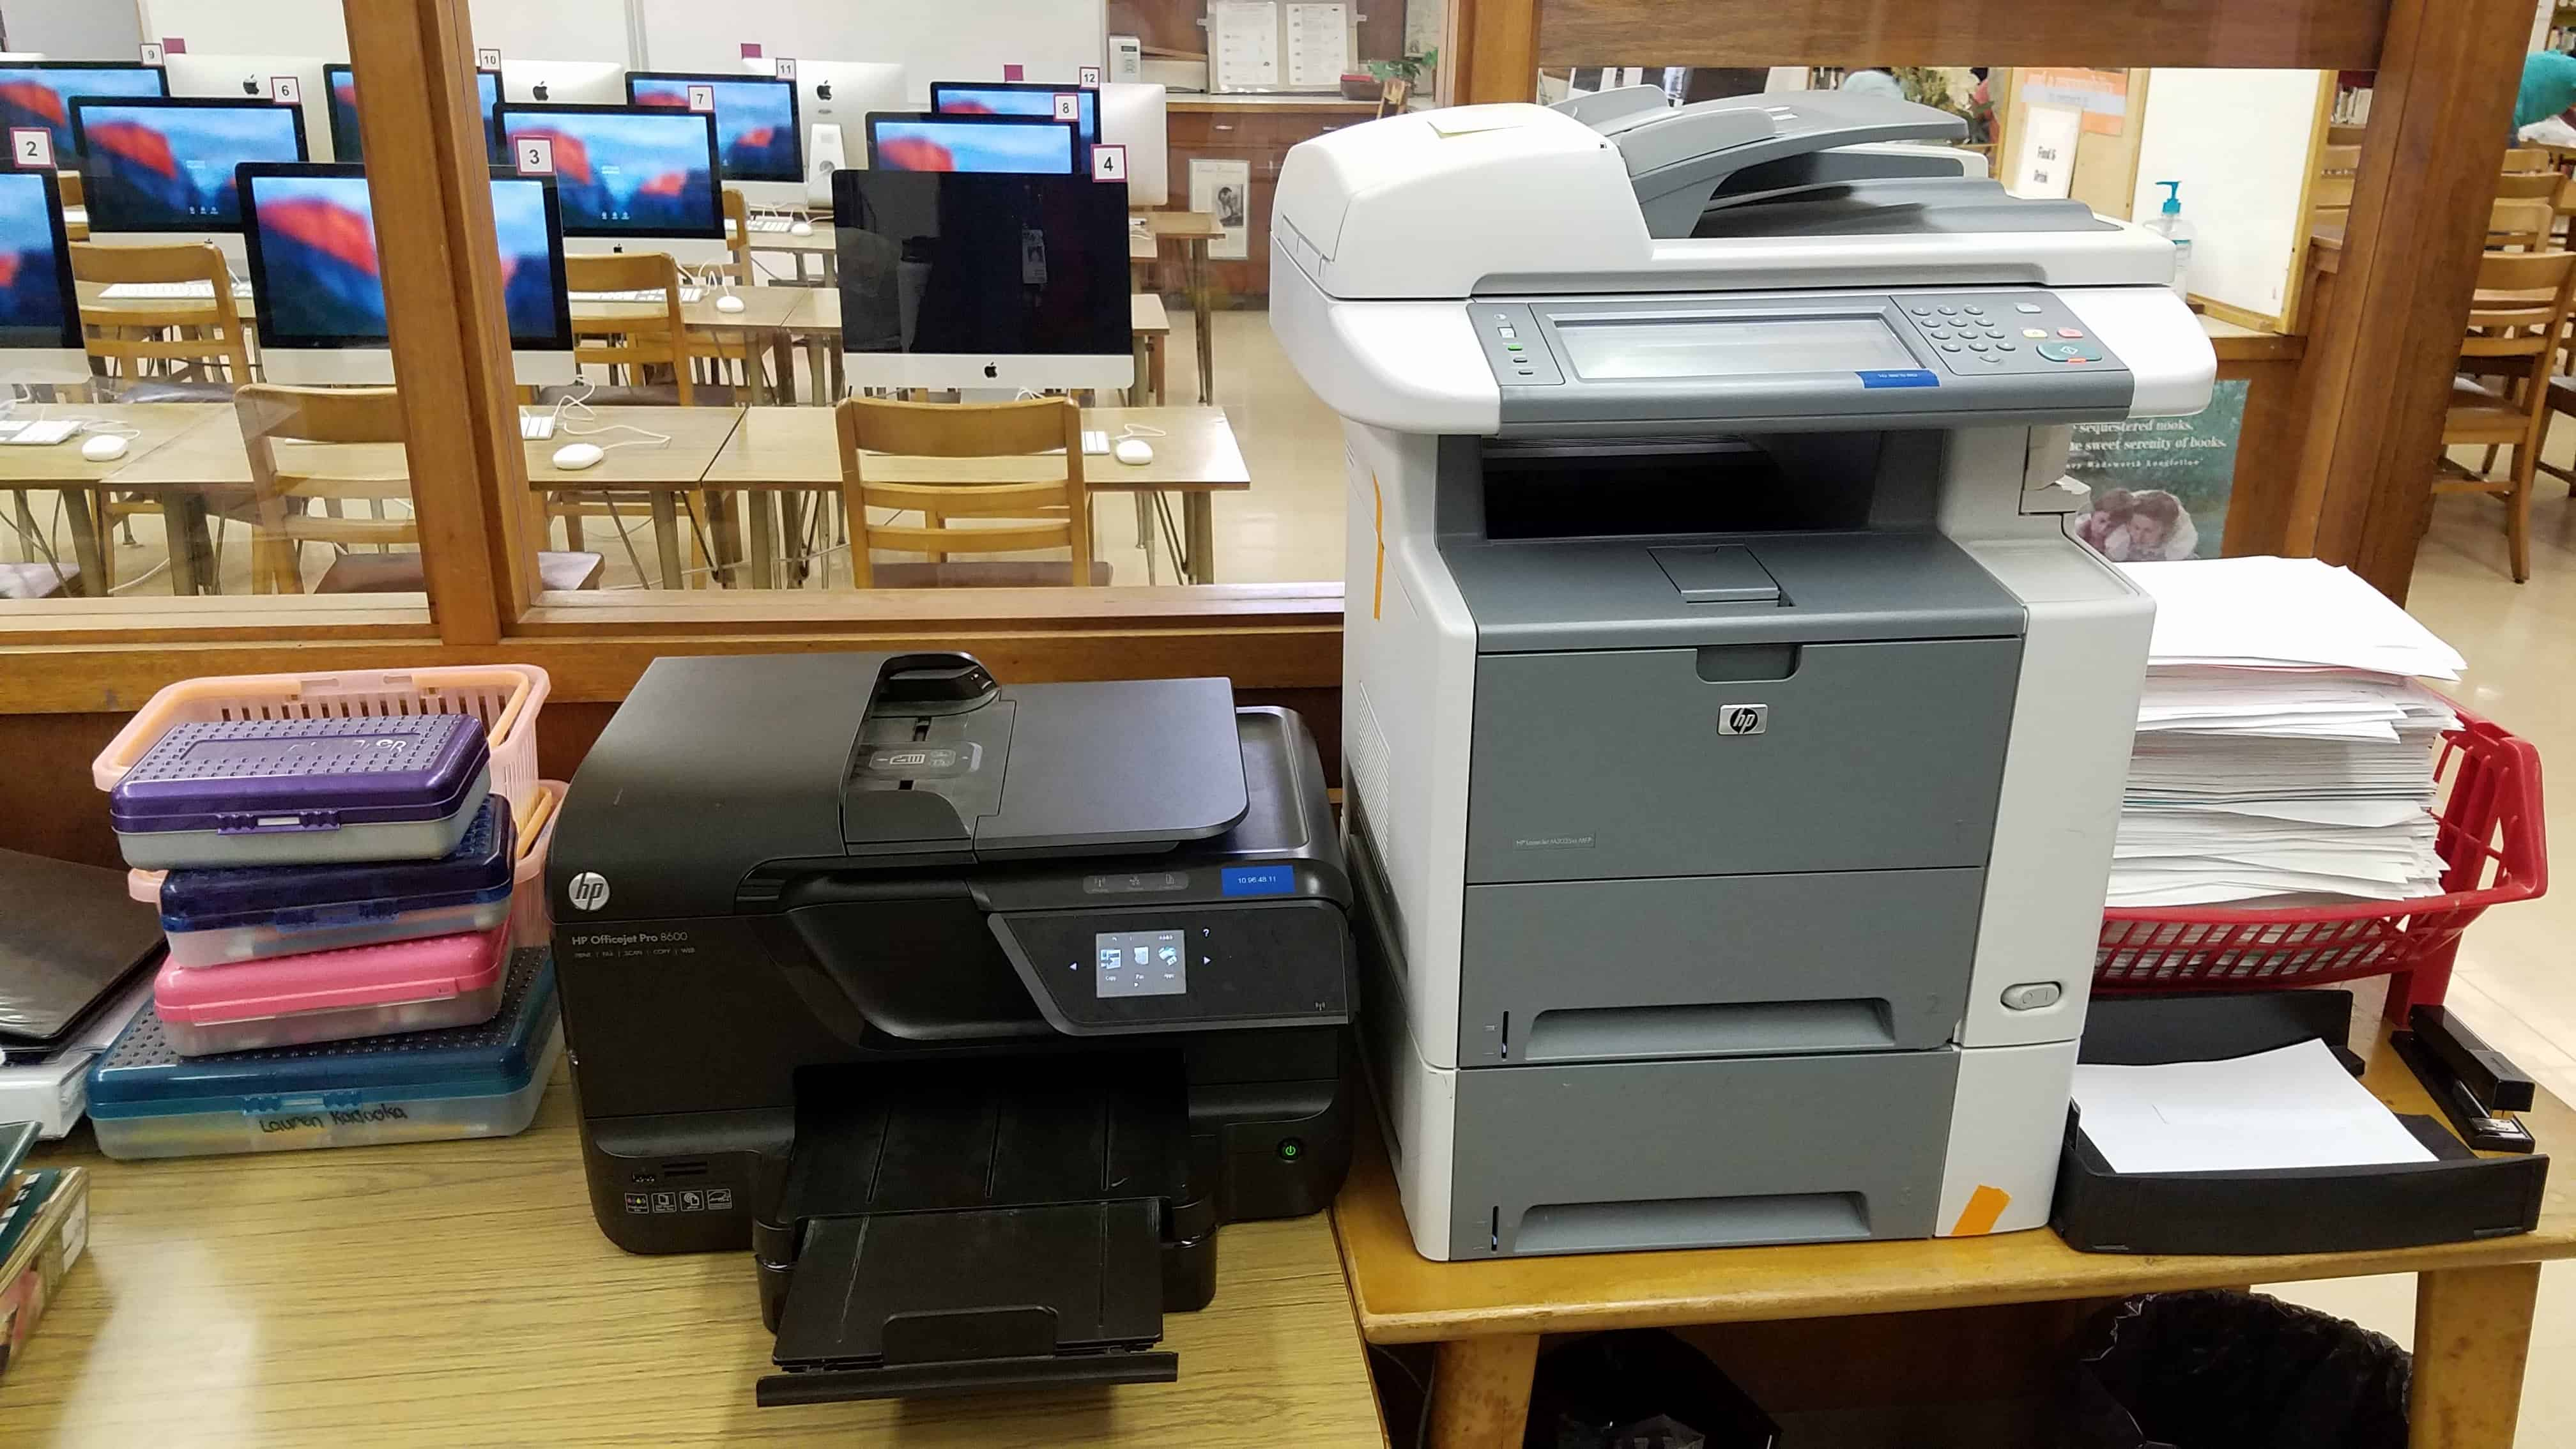 HP Officejet Pro 8600 κλείσιμο υπηρεσία γνωριμιών Ιντιανάπολις